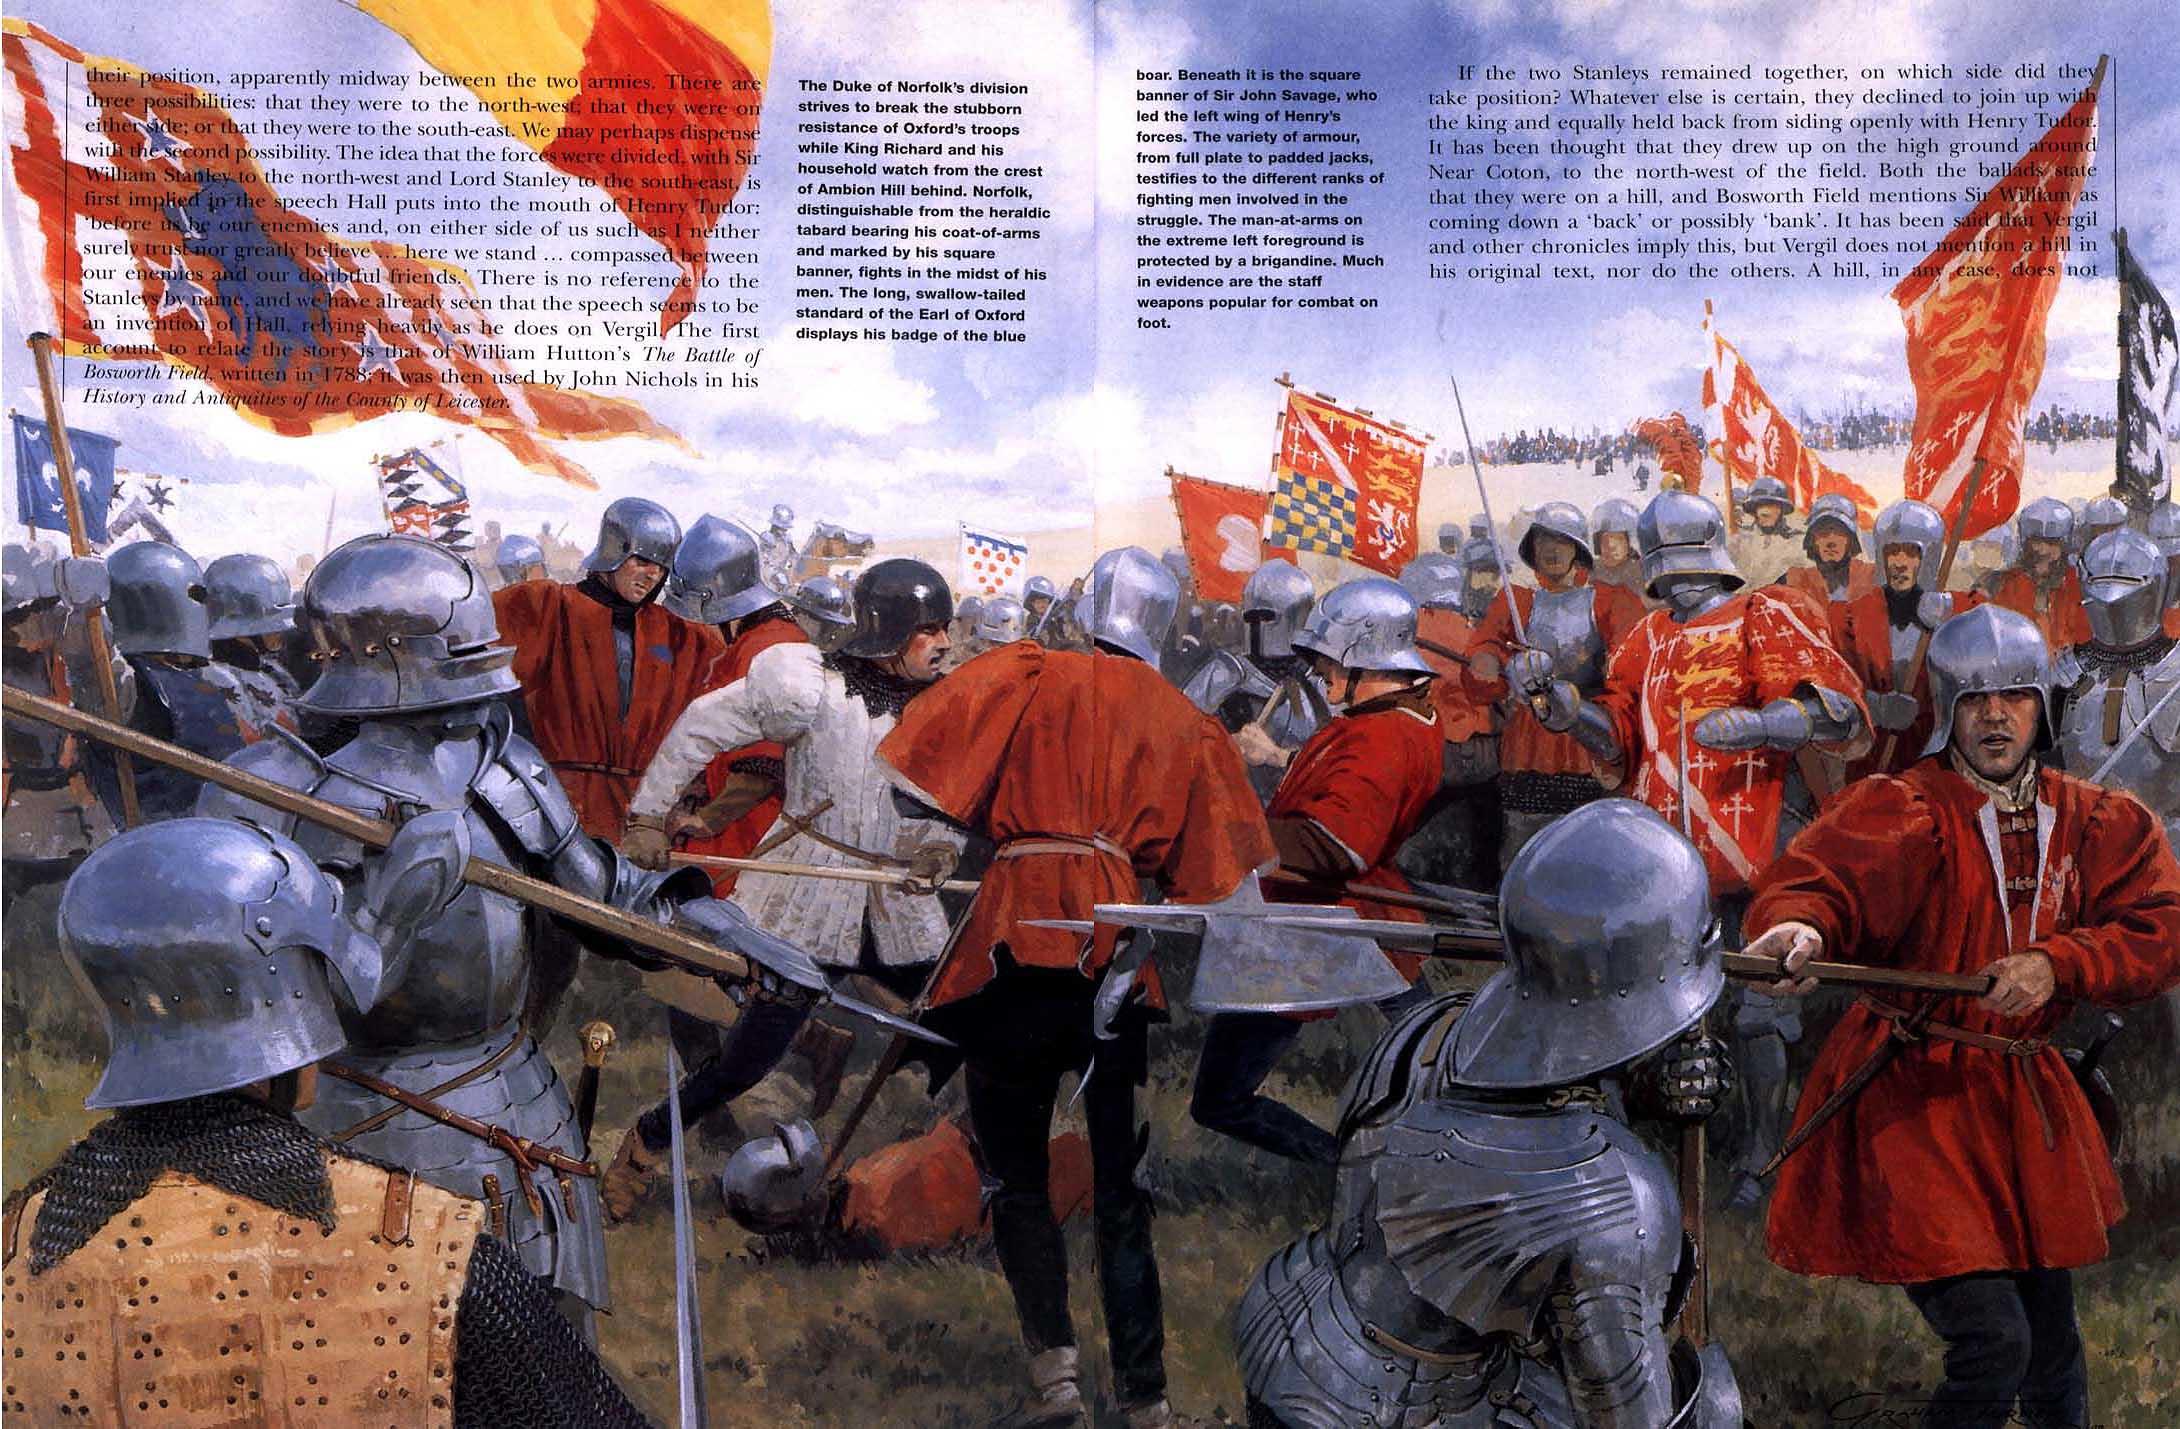 http://www.ljplus.ru/img4/t/r/trommell_of_war/oxford.jpg